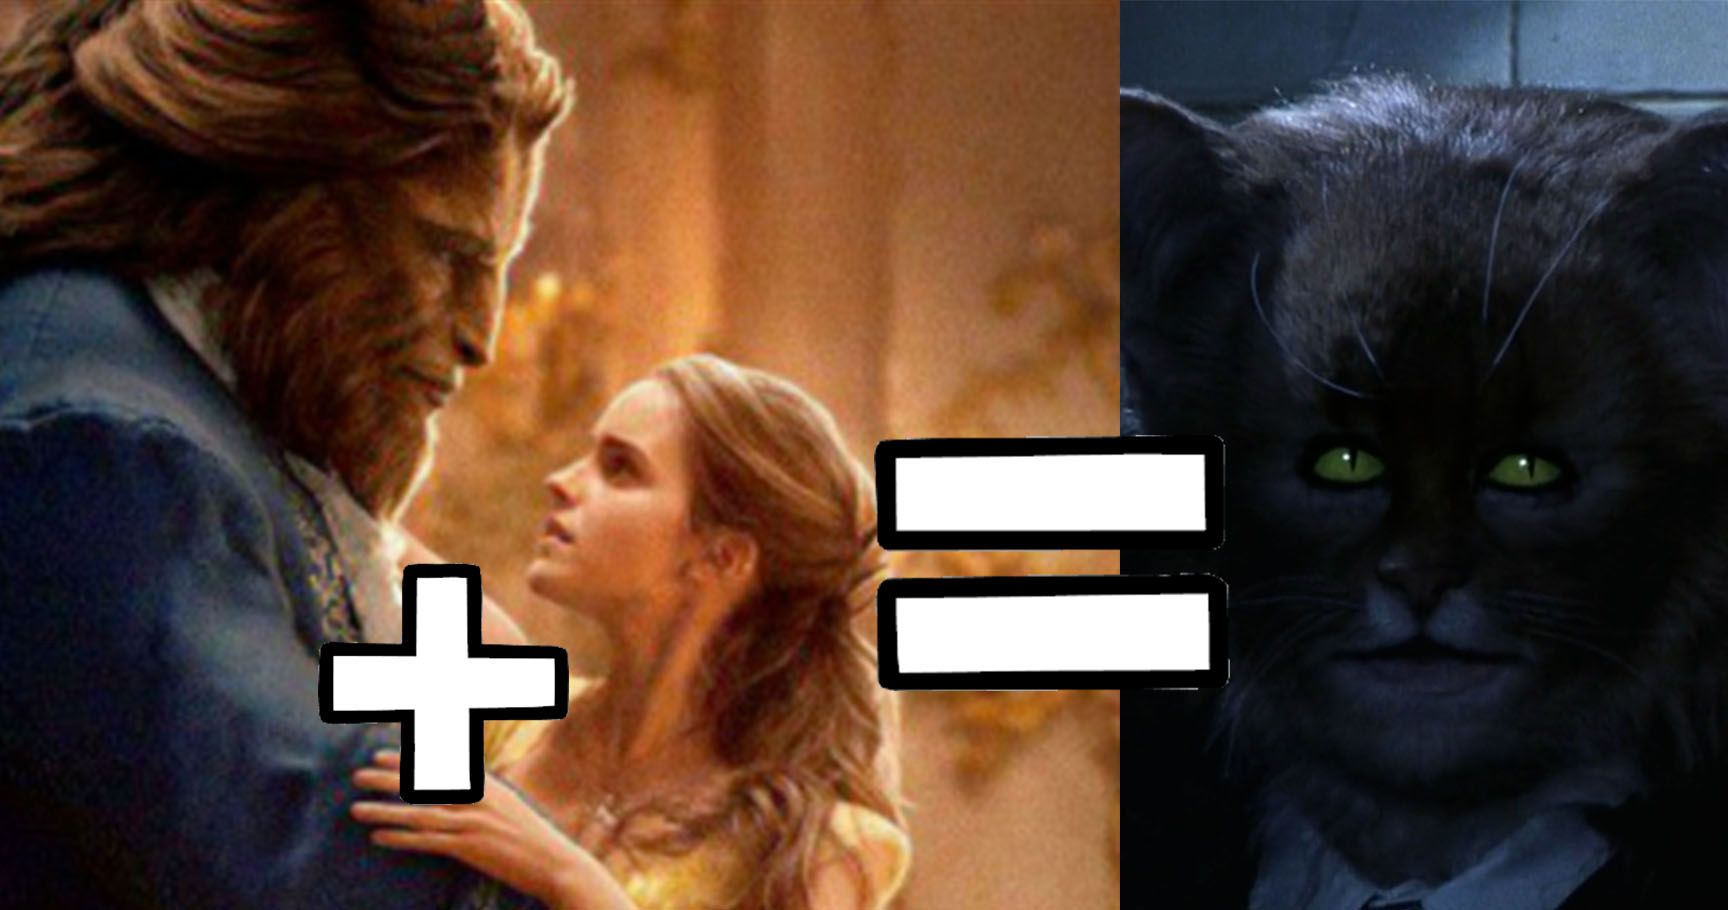 15 Hilarious Harry Potter x Disney Mashups Guaranteed To Make You LOL